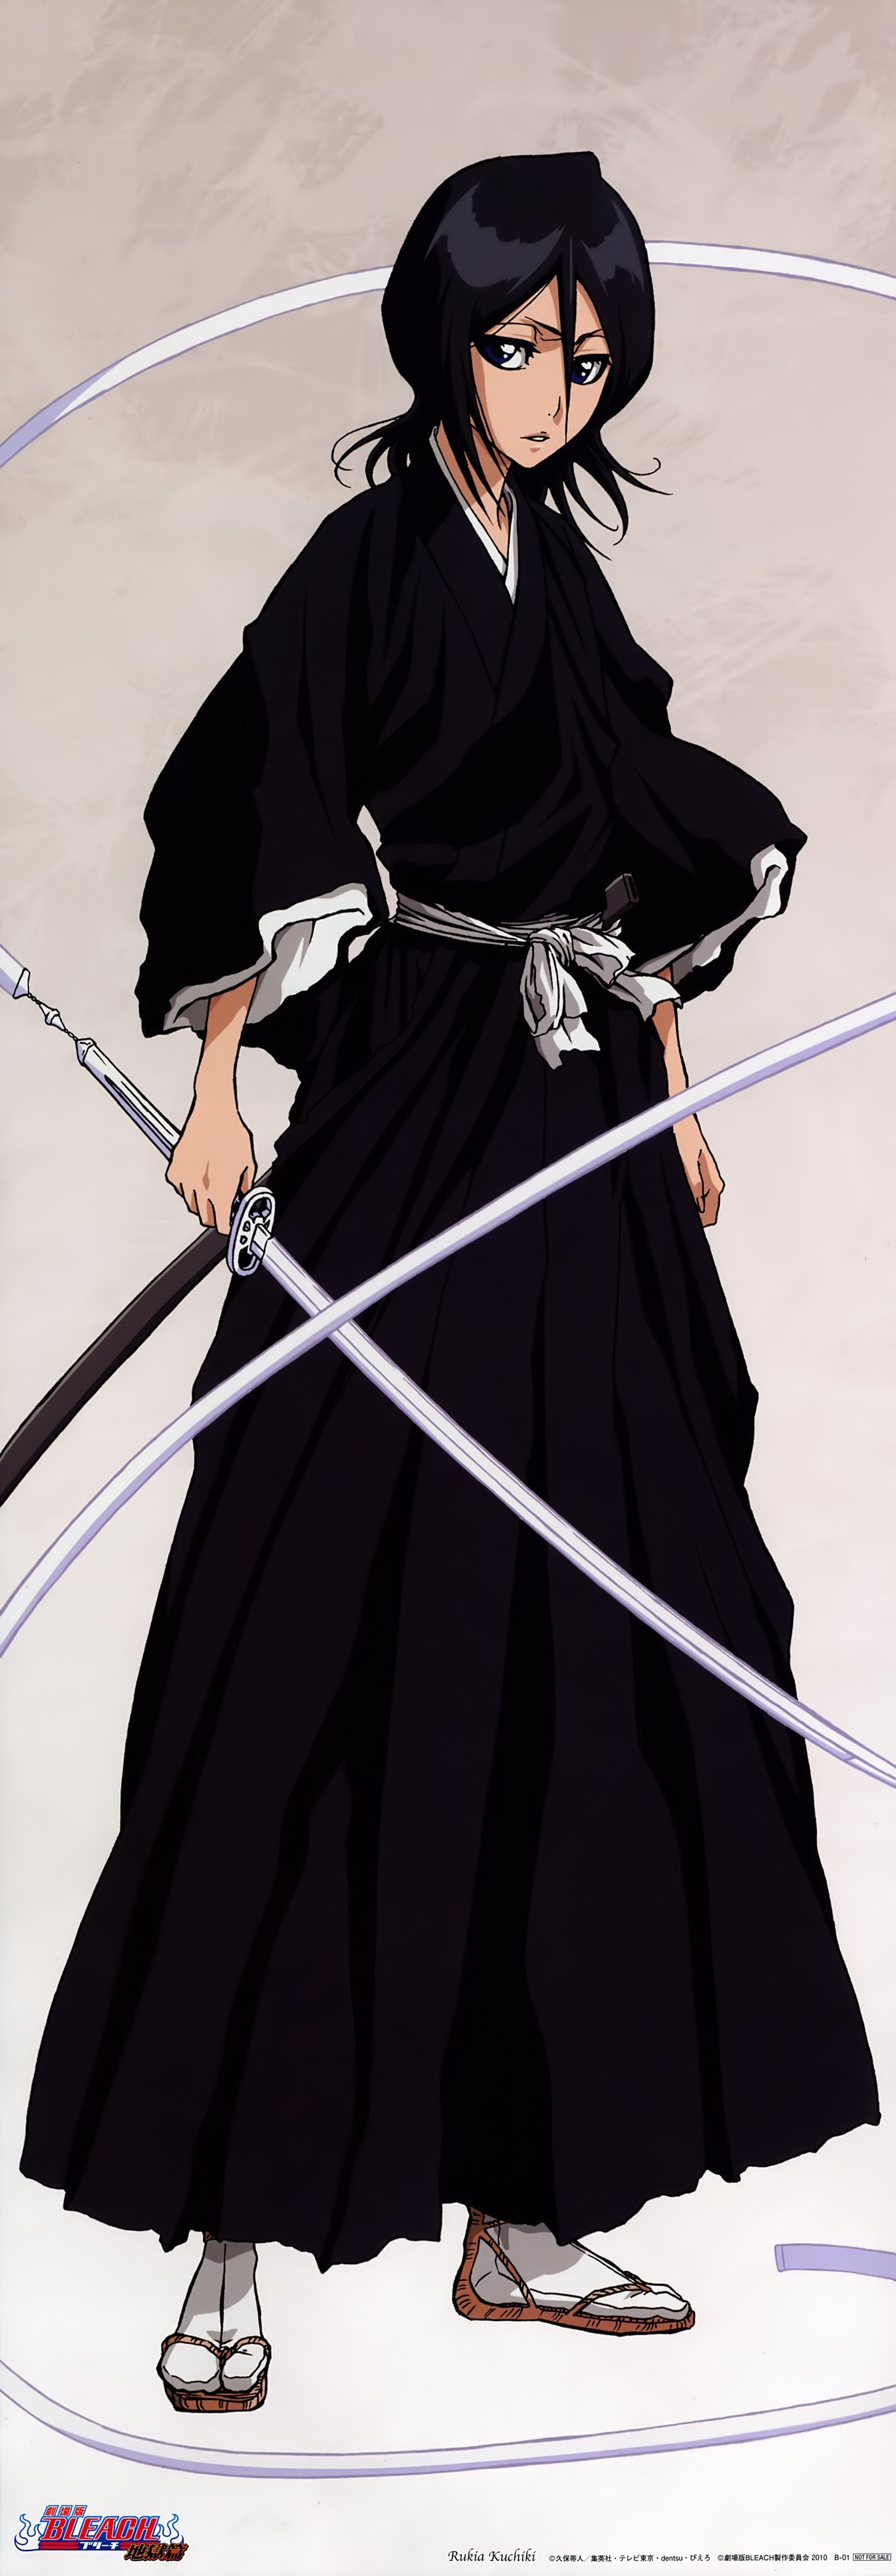 Anime 1780x5118 Bleach Kuchiki Rukia anime girls women with swords anime dark hair